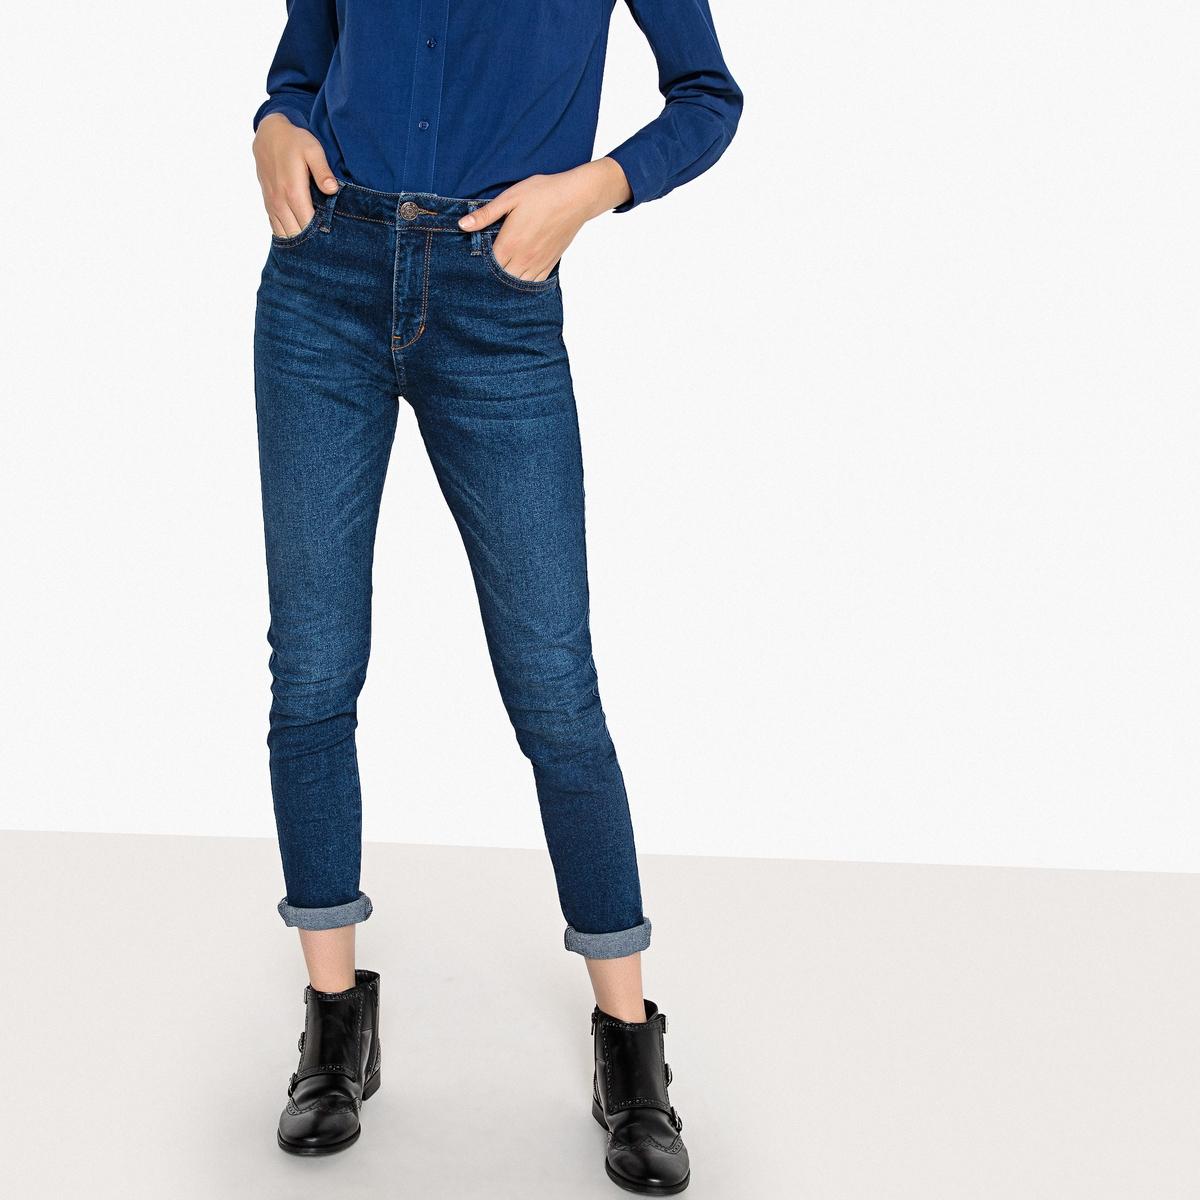 Джинсы узкие джинсы узкие l32